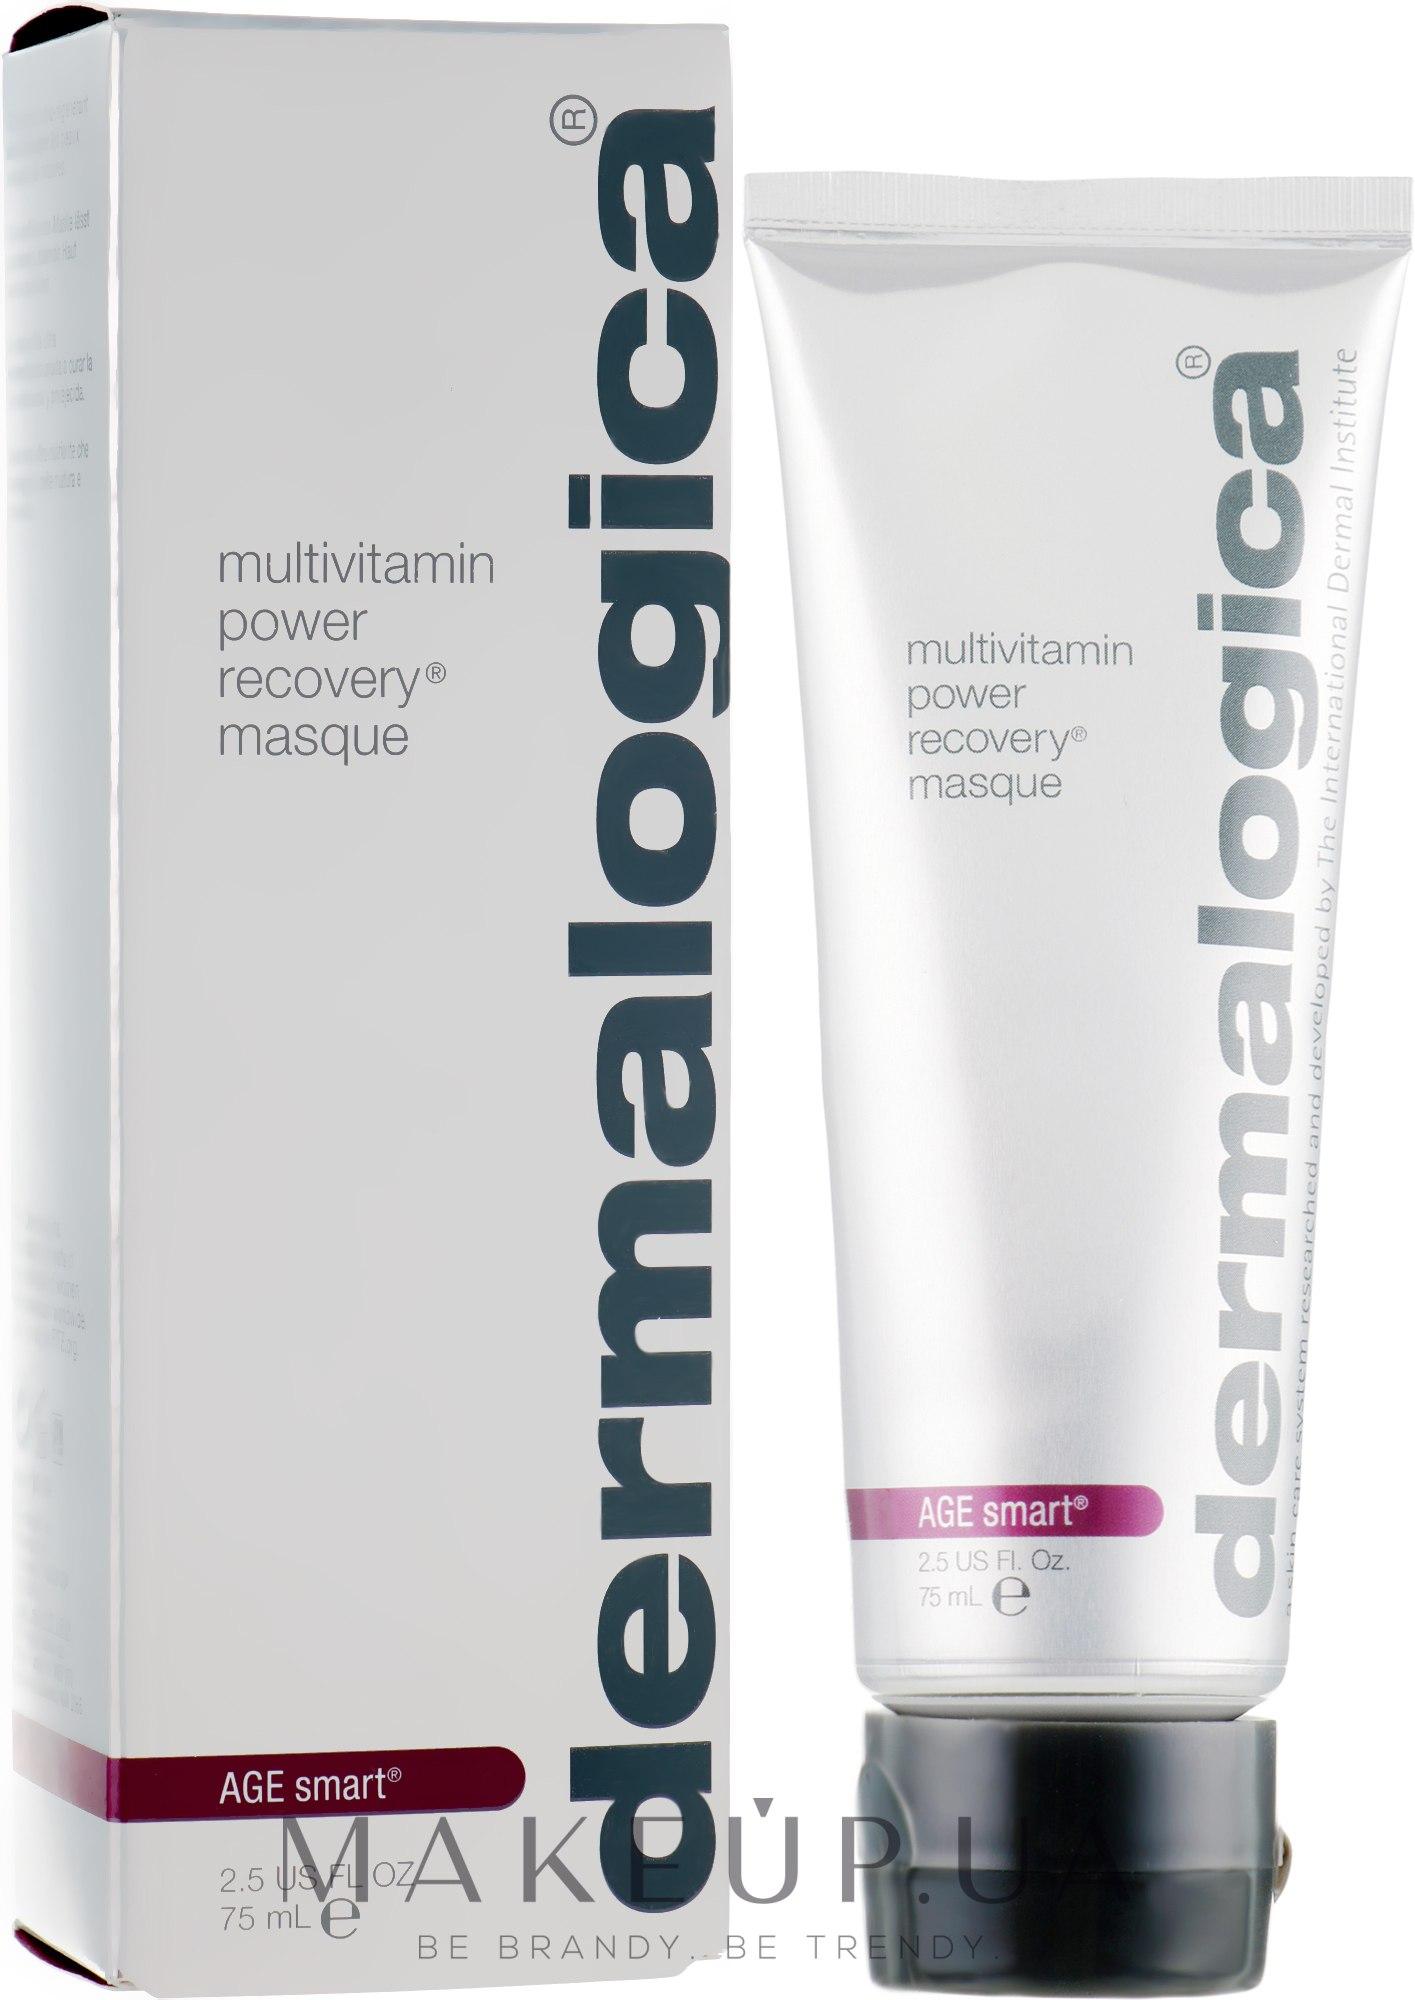 Мультивитаминная восстанавливающая маска для лица - Dermalogica Age smart Multivitamin Masque — фото 75ml